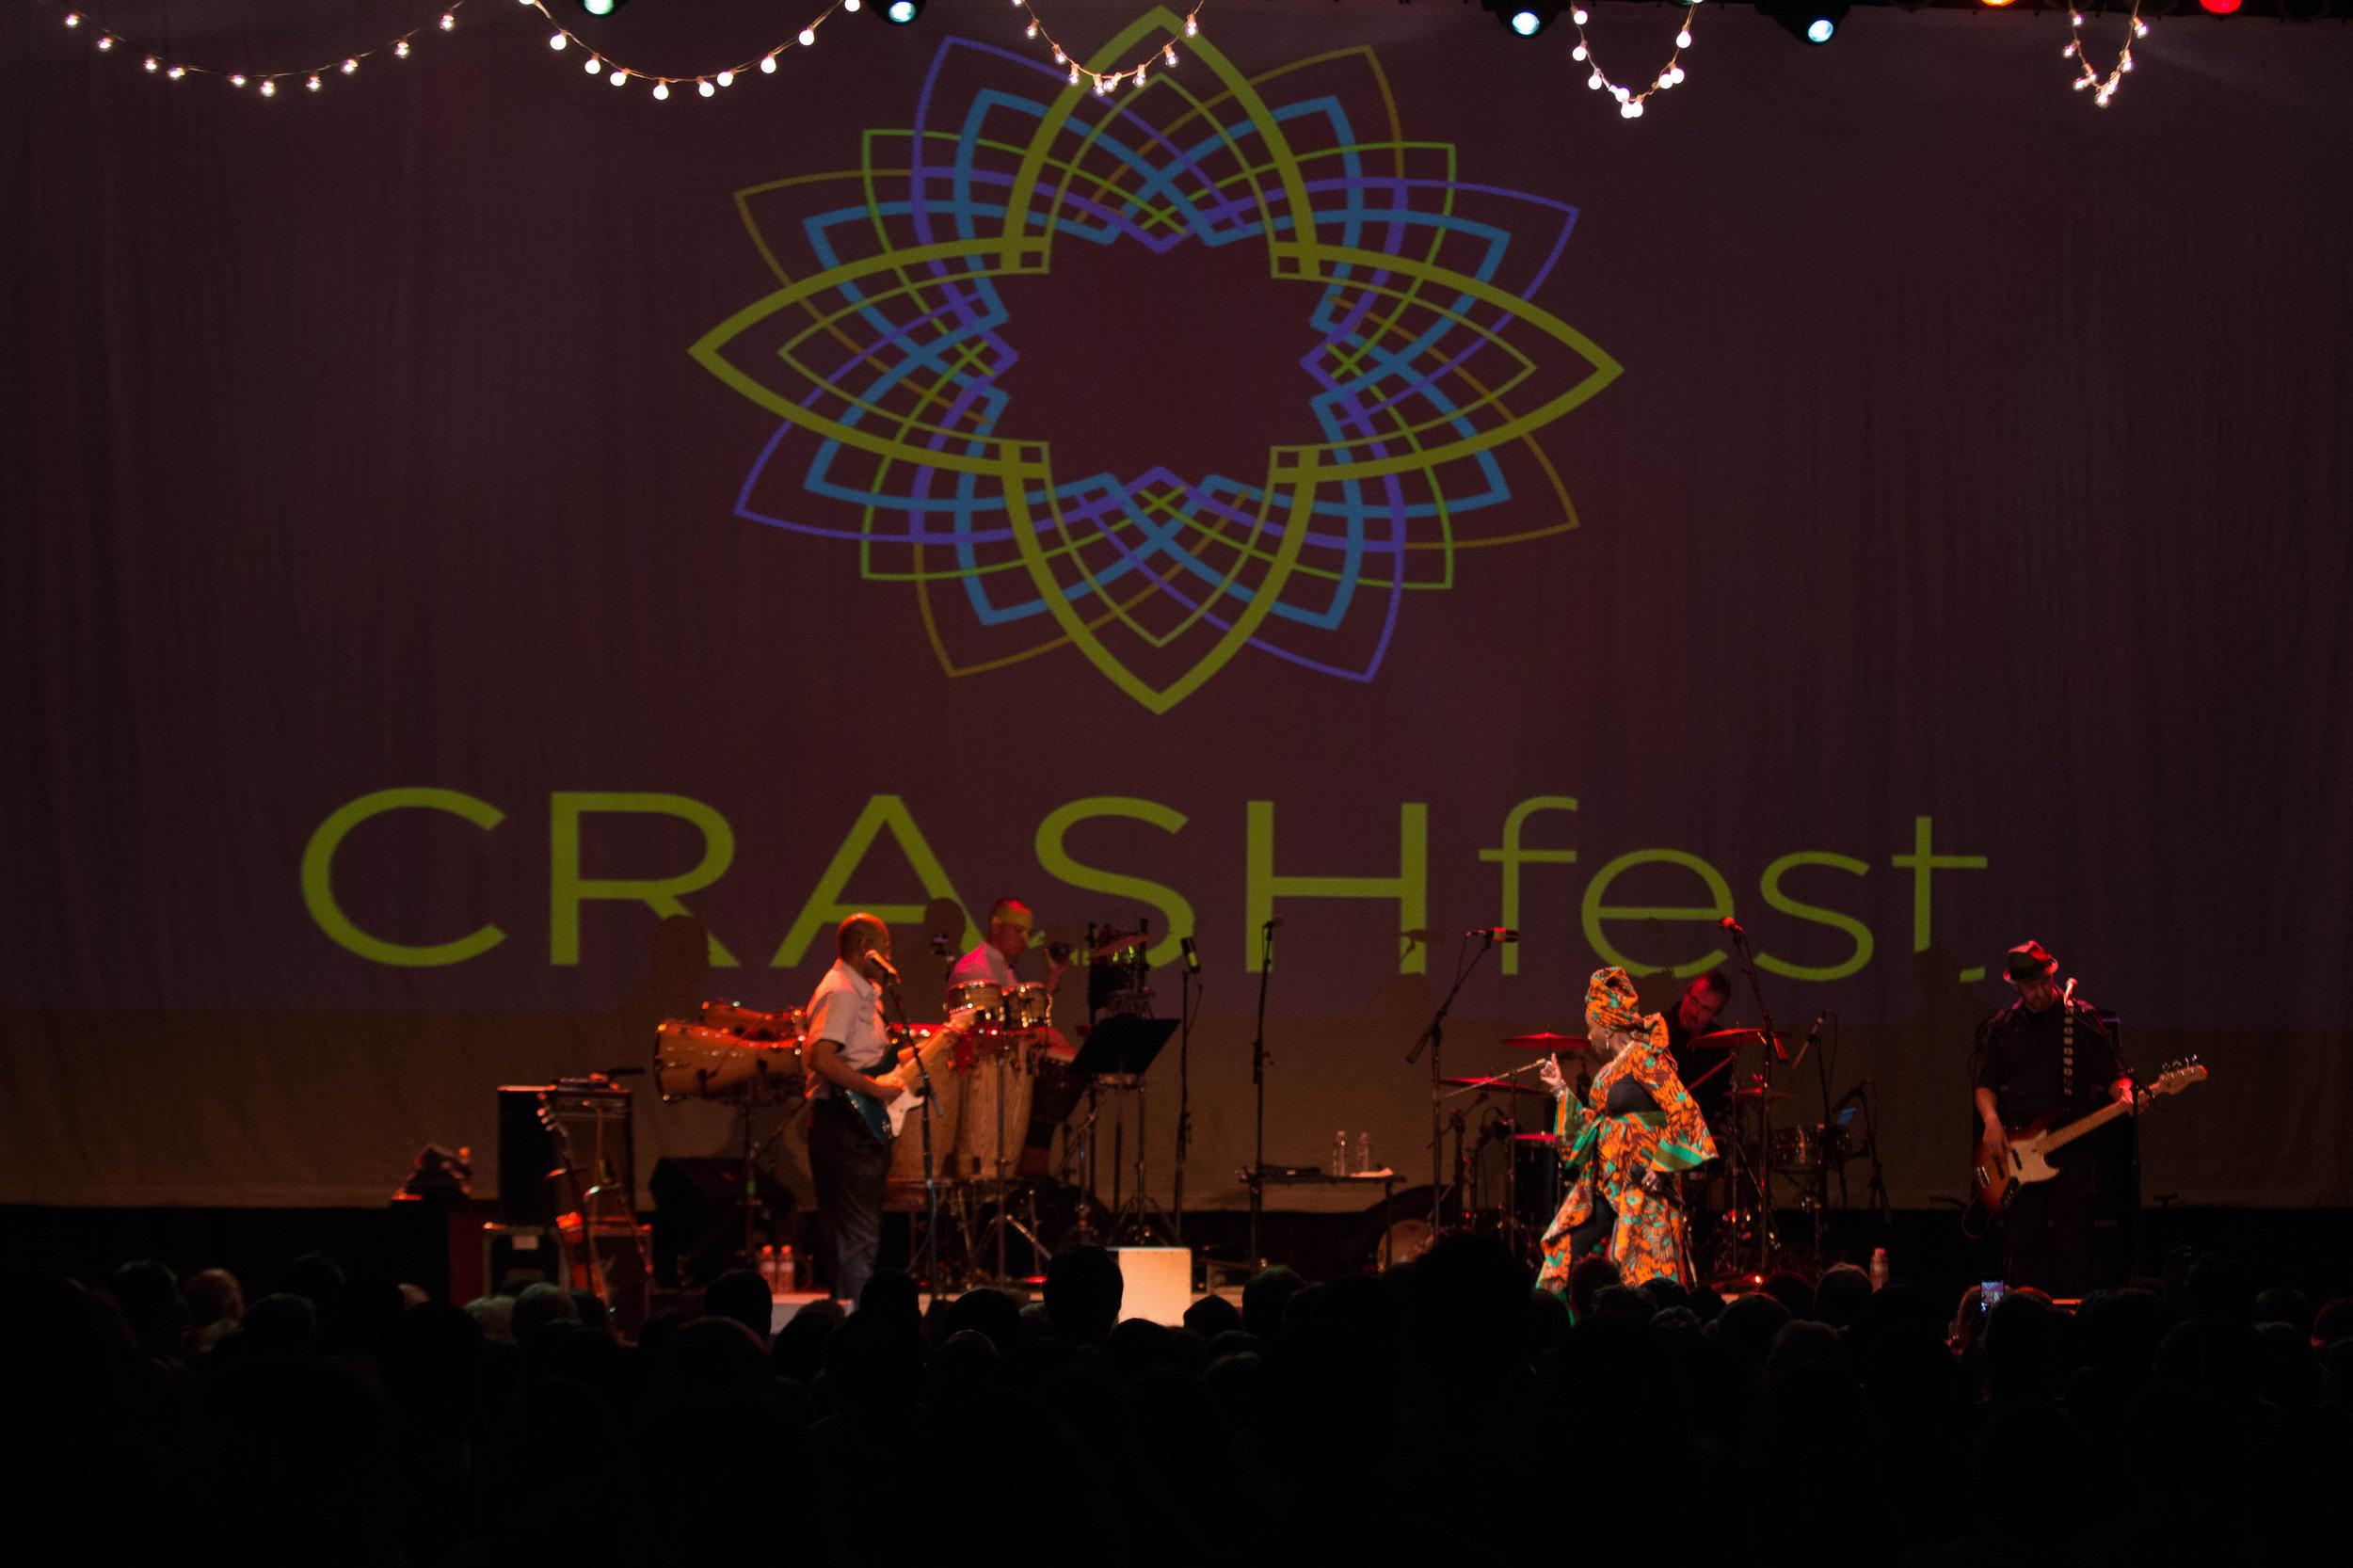 CrashFest2016_250.jpg